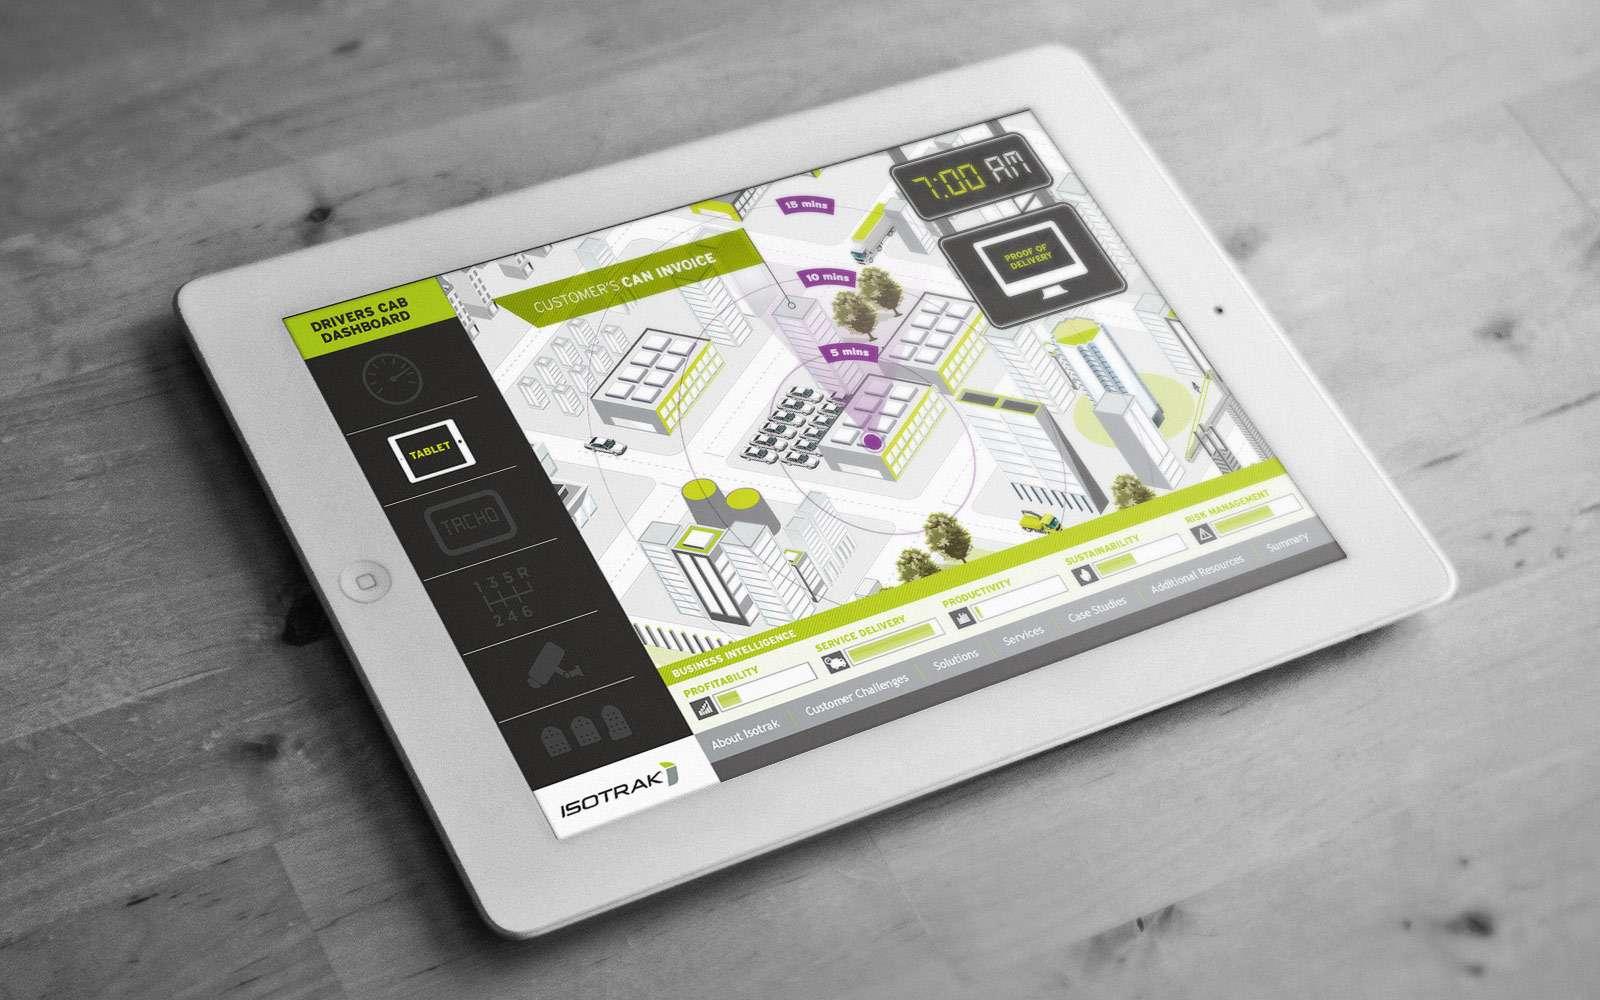 White iPad displaying Isotrak digital illustrated map on touchscreen presentation